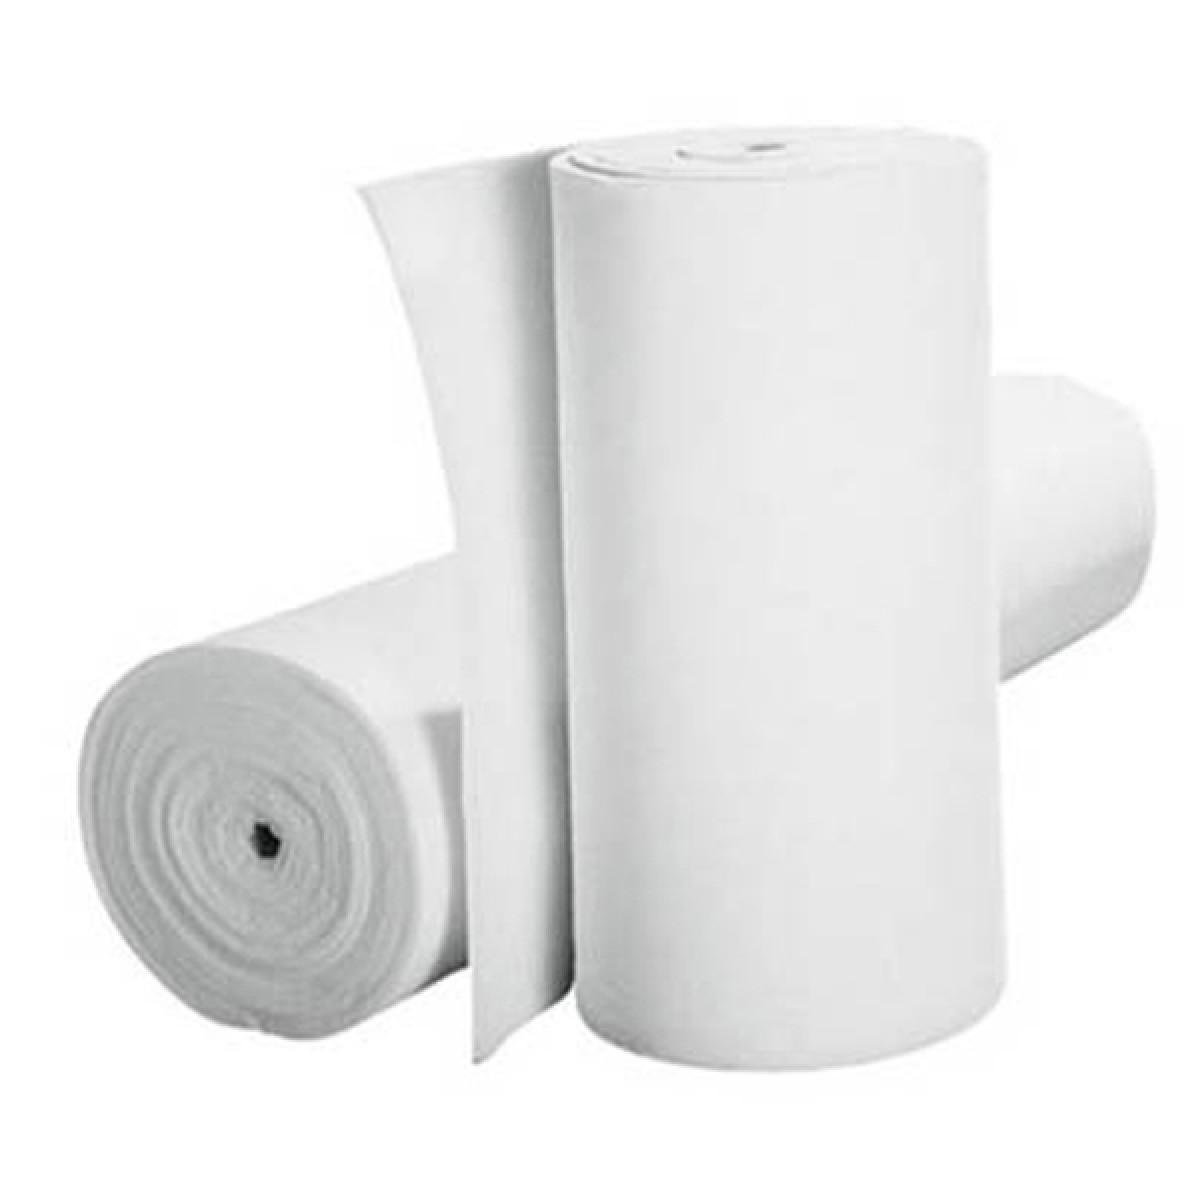 Tessuto filtrante spess. 15 mmrotolo h. 1500 mm.